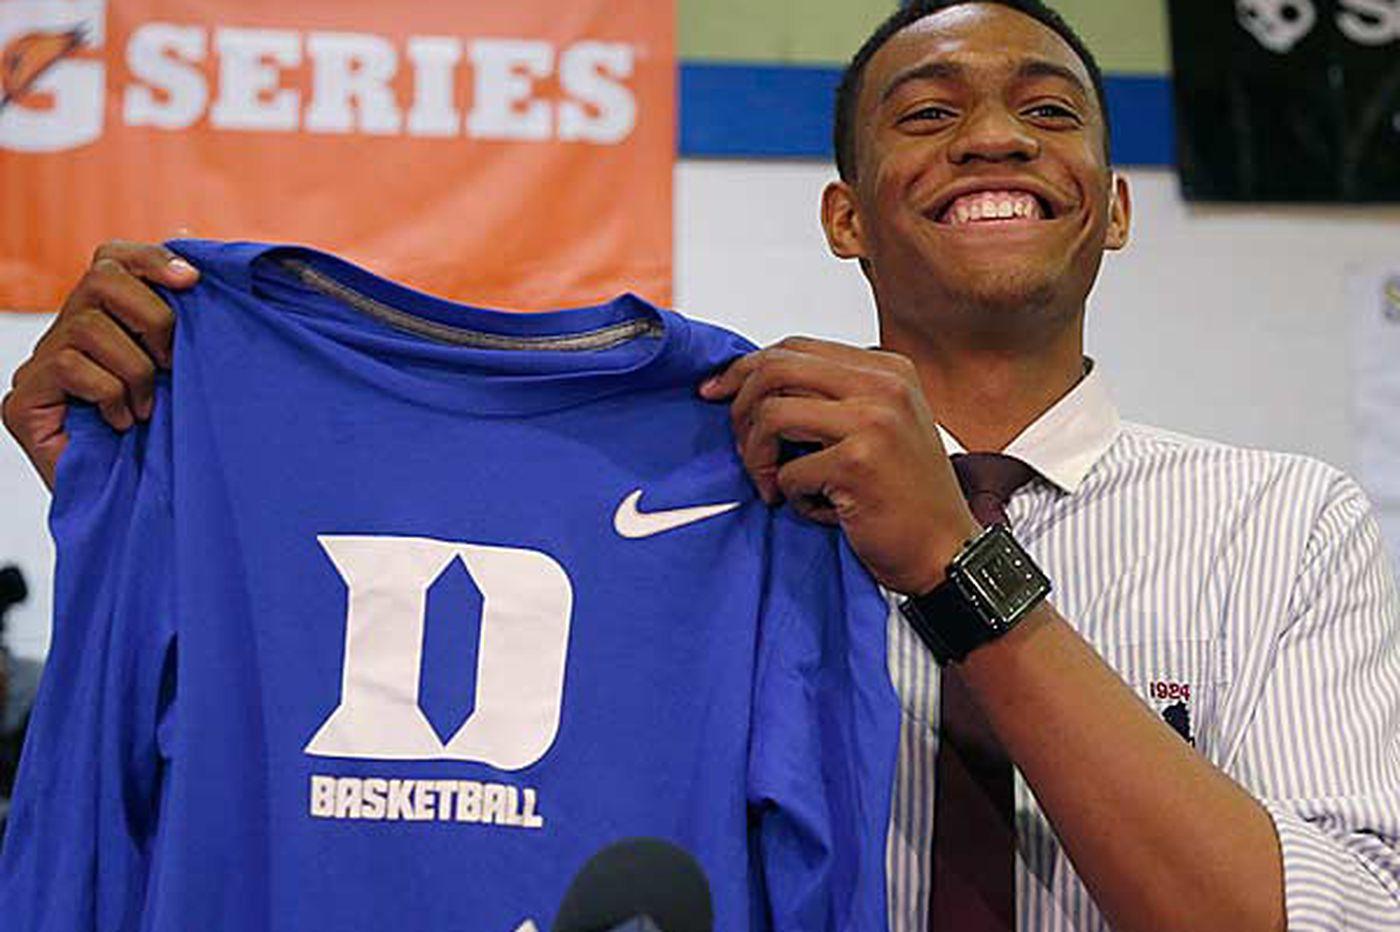 College Basketball: Top prospect Parker chooses Duke